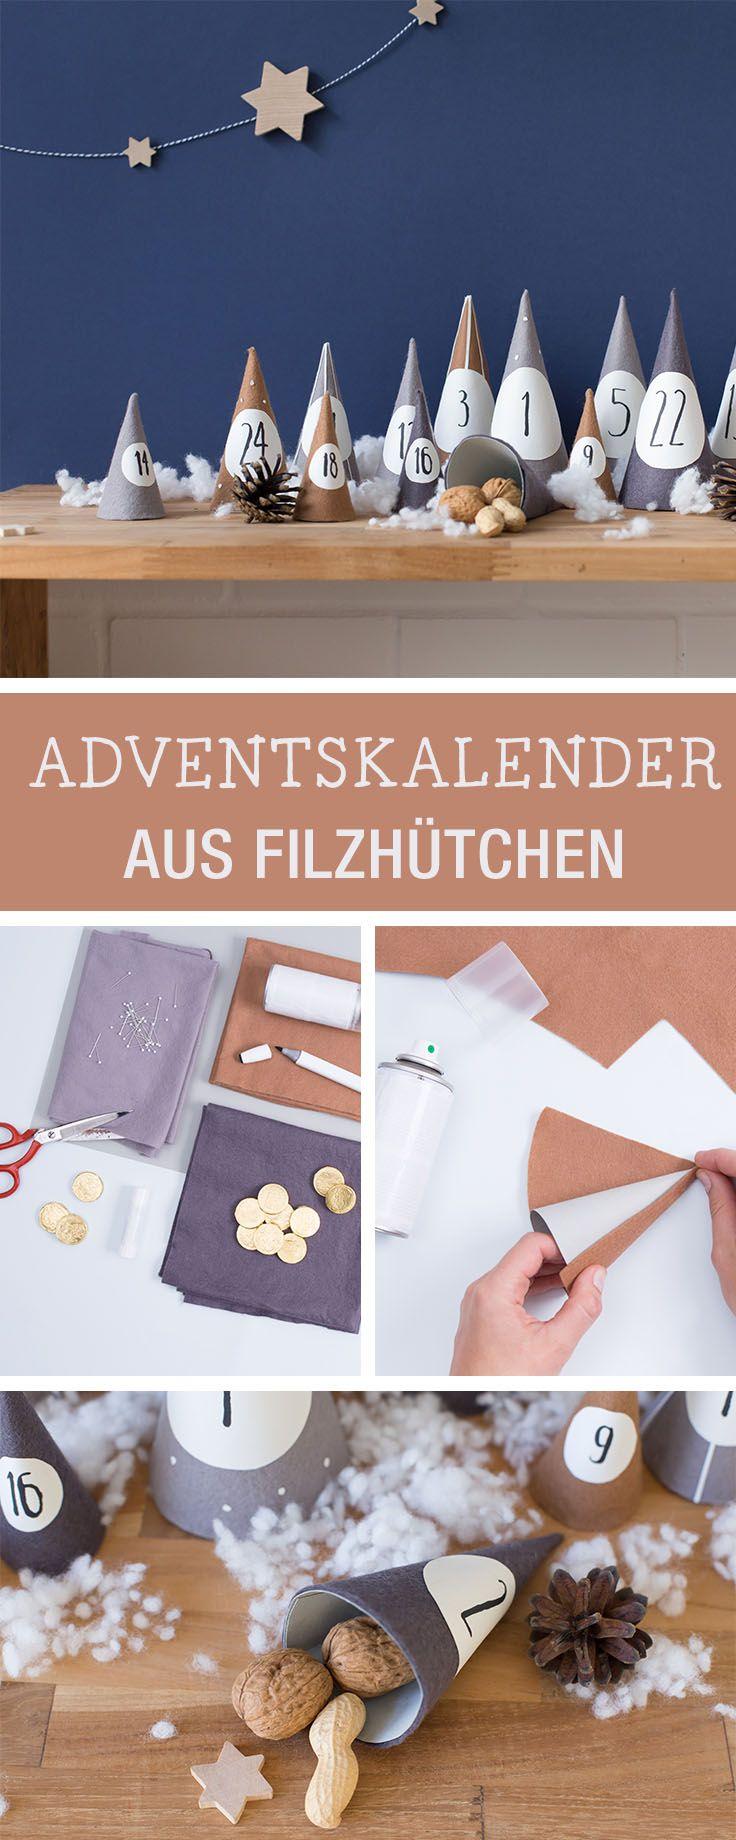 Adventskalender aus Filzhüten selbermachen / christmas diy: how to craft an advents calendar with felt via DaWanda.com